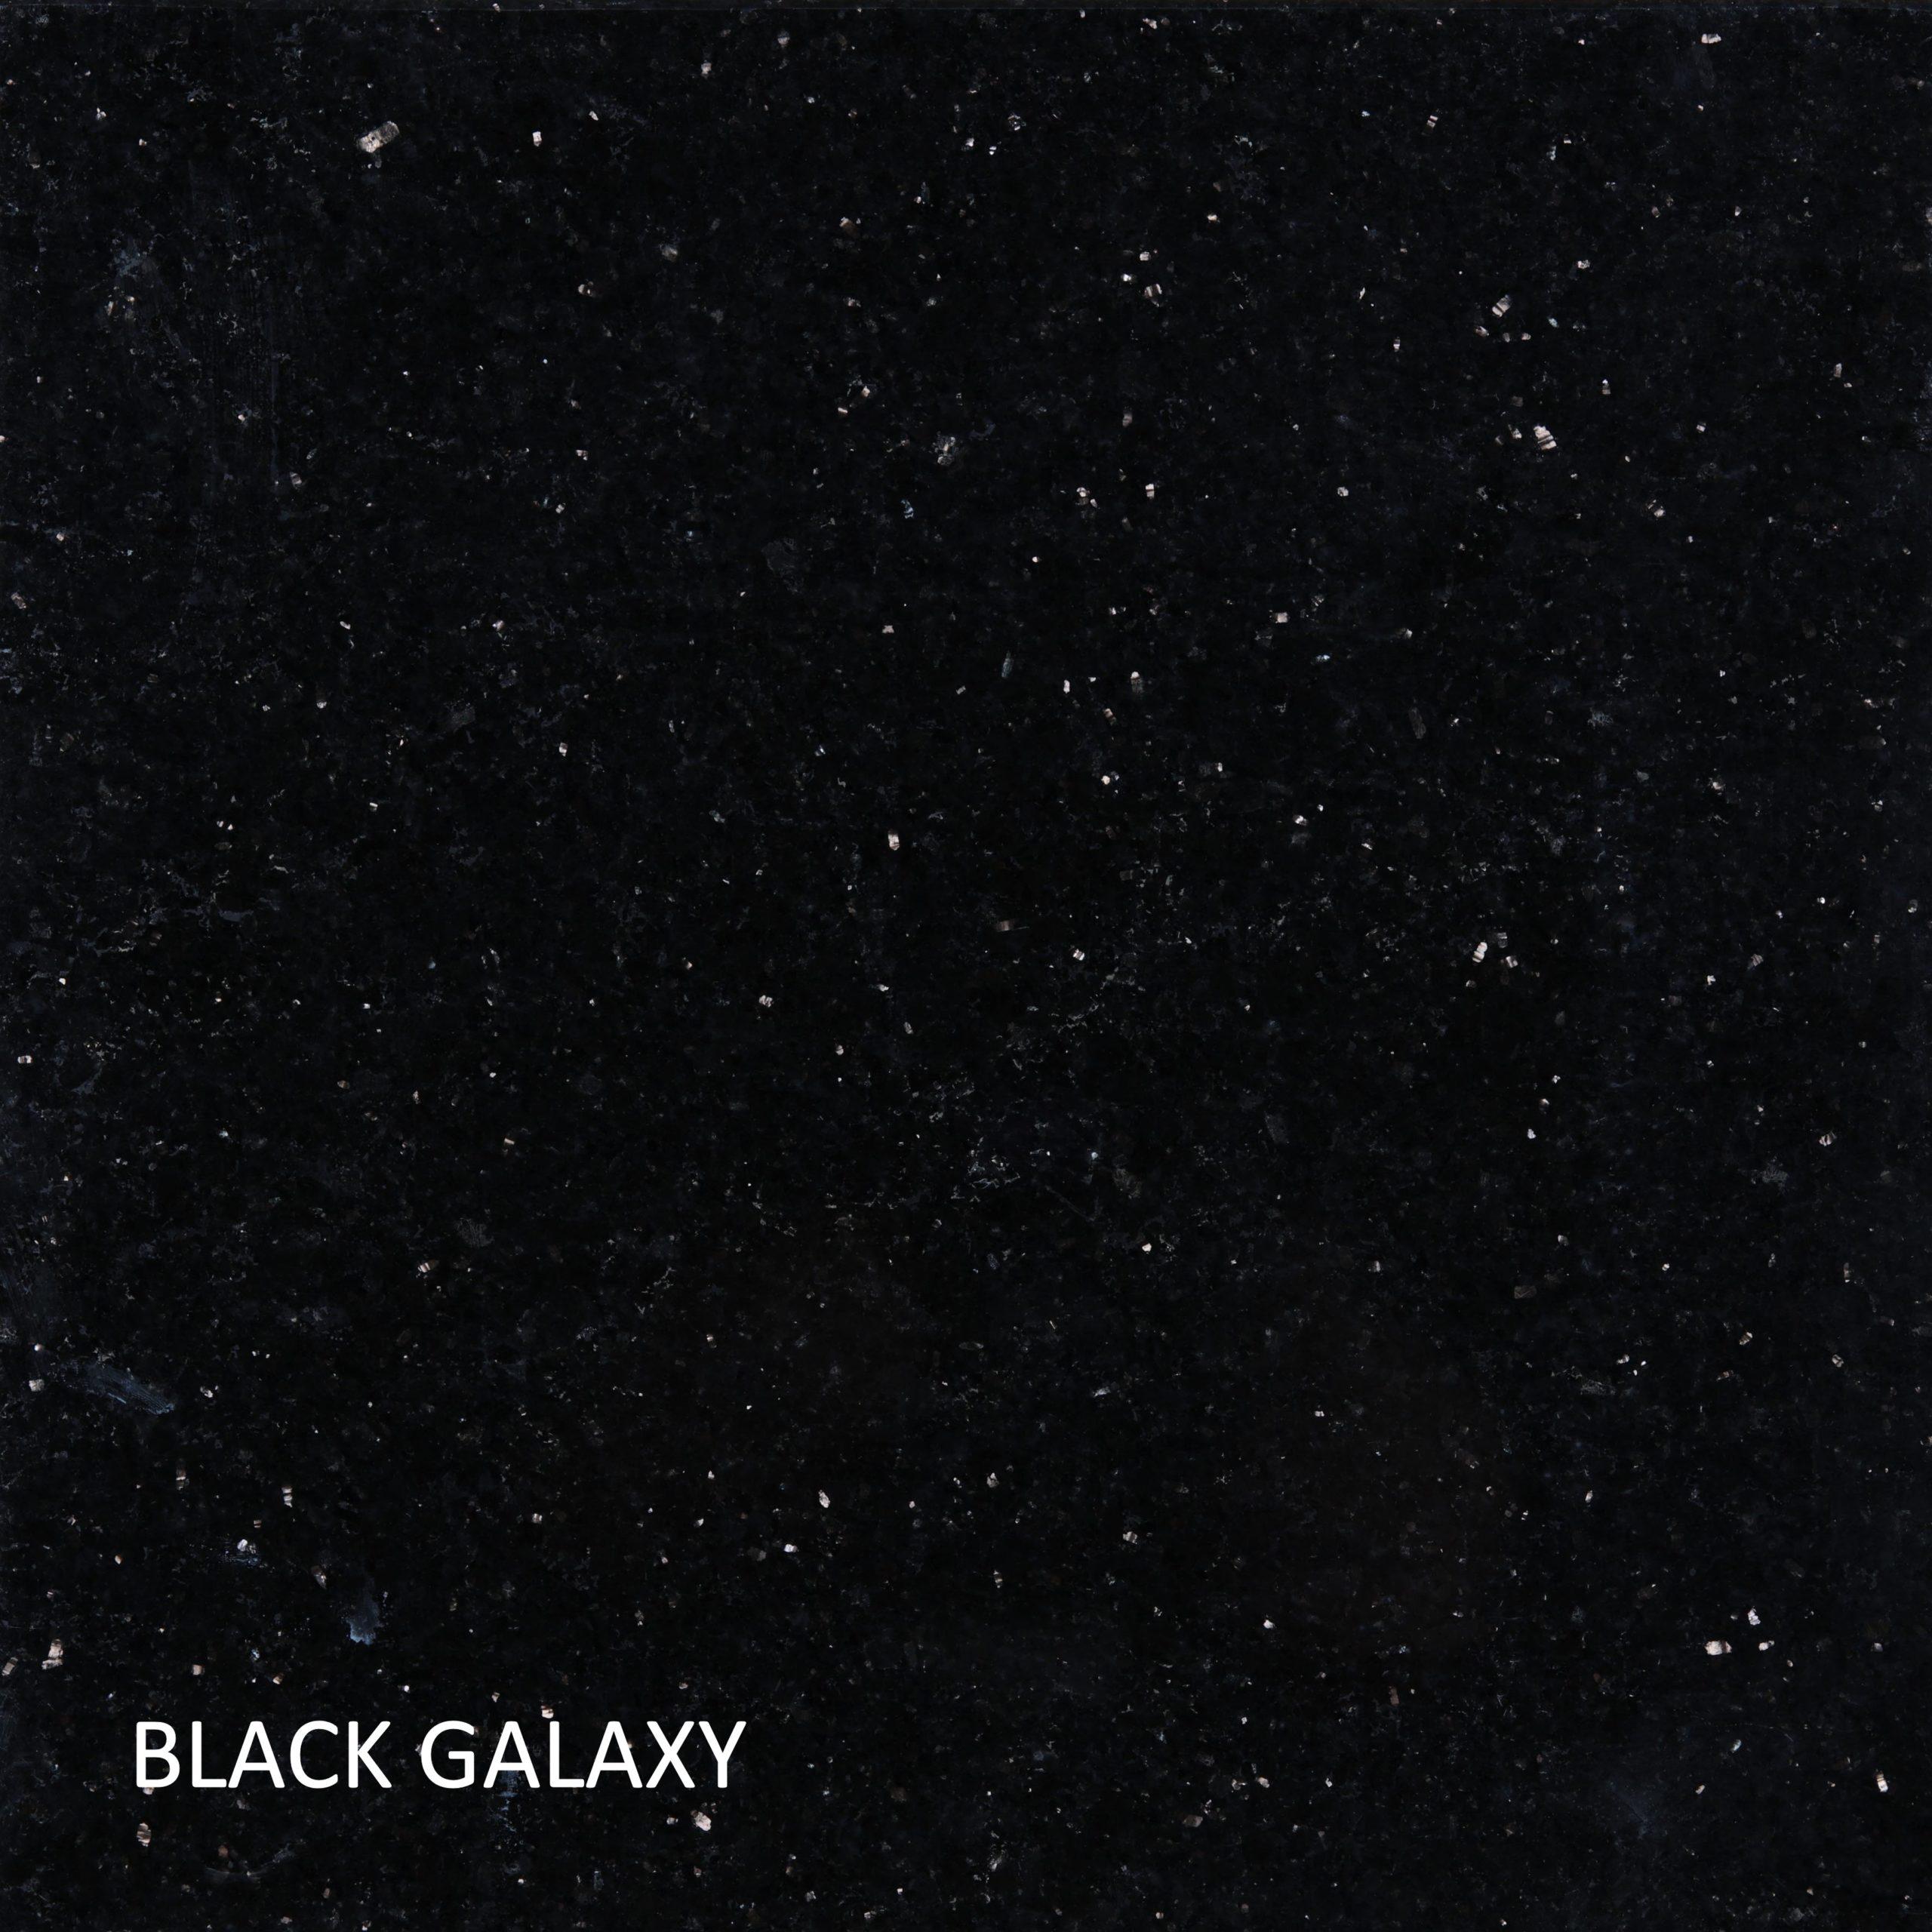 Noir-Schwarz-Galaxy